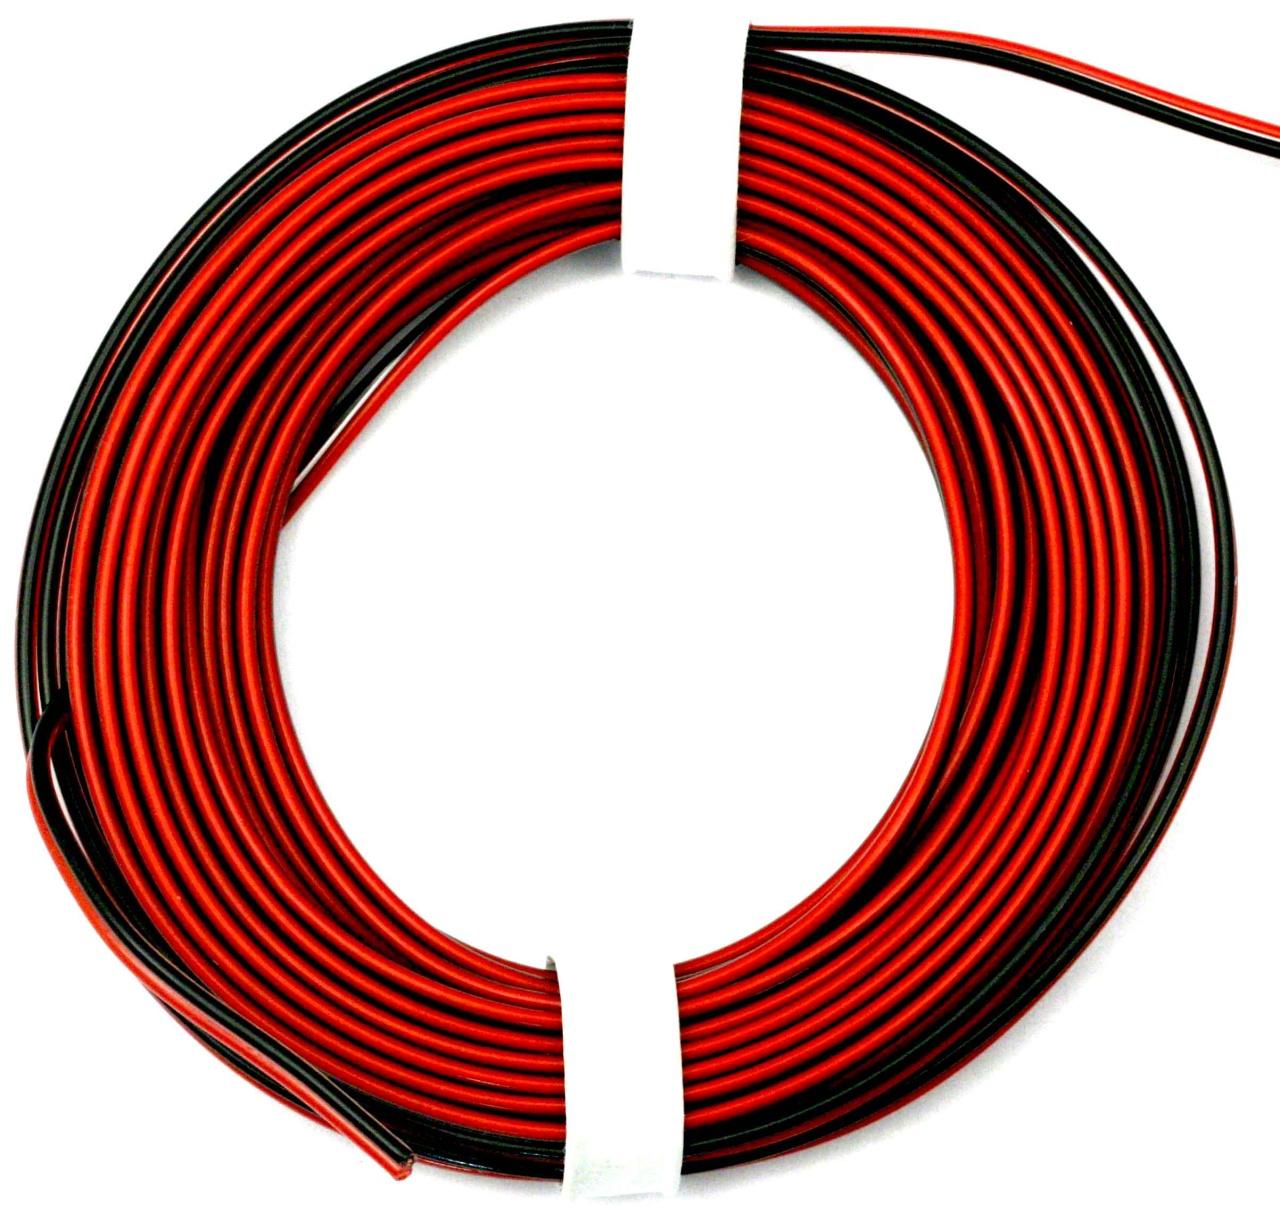 PVC-Litze 2x 0,25 mm², 5m rot/schwarz